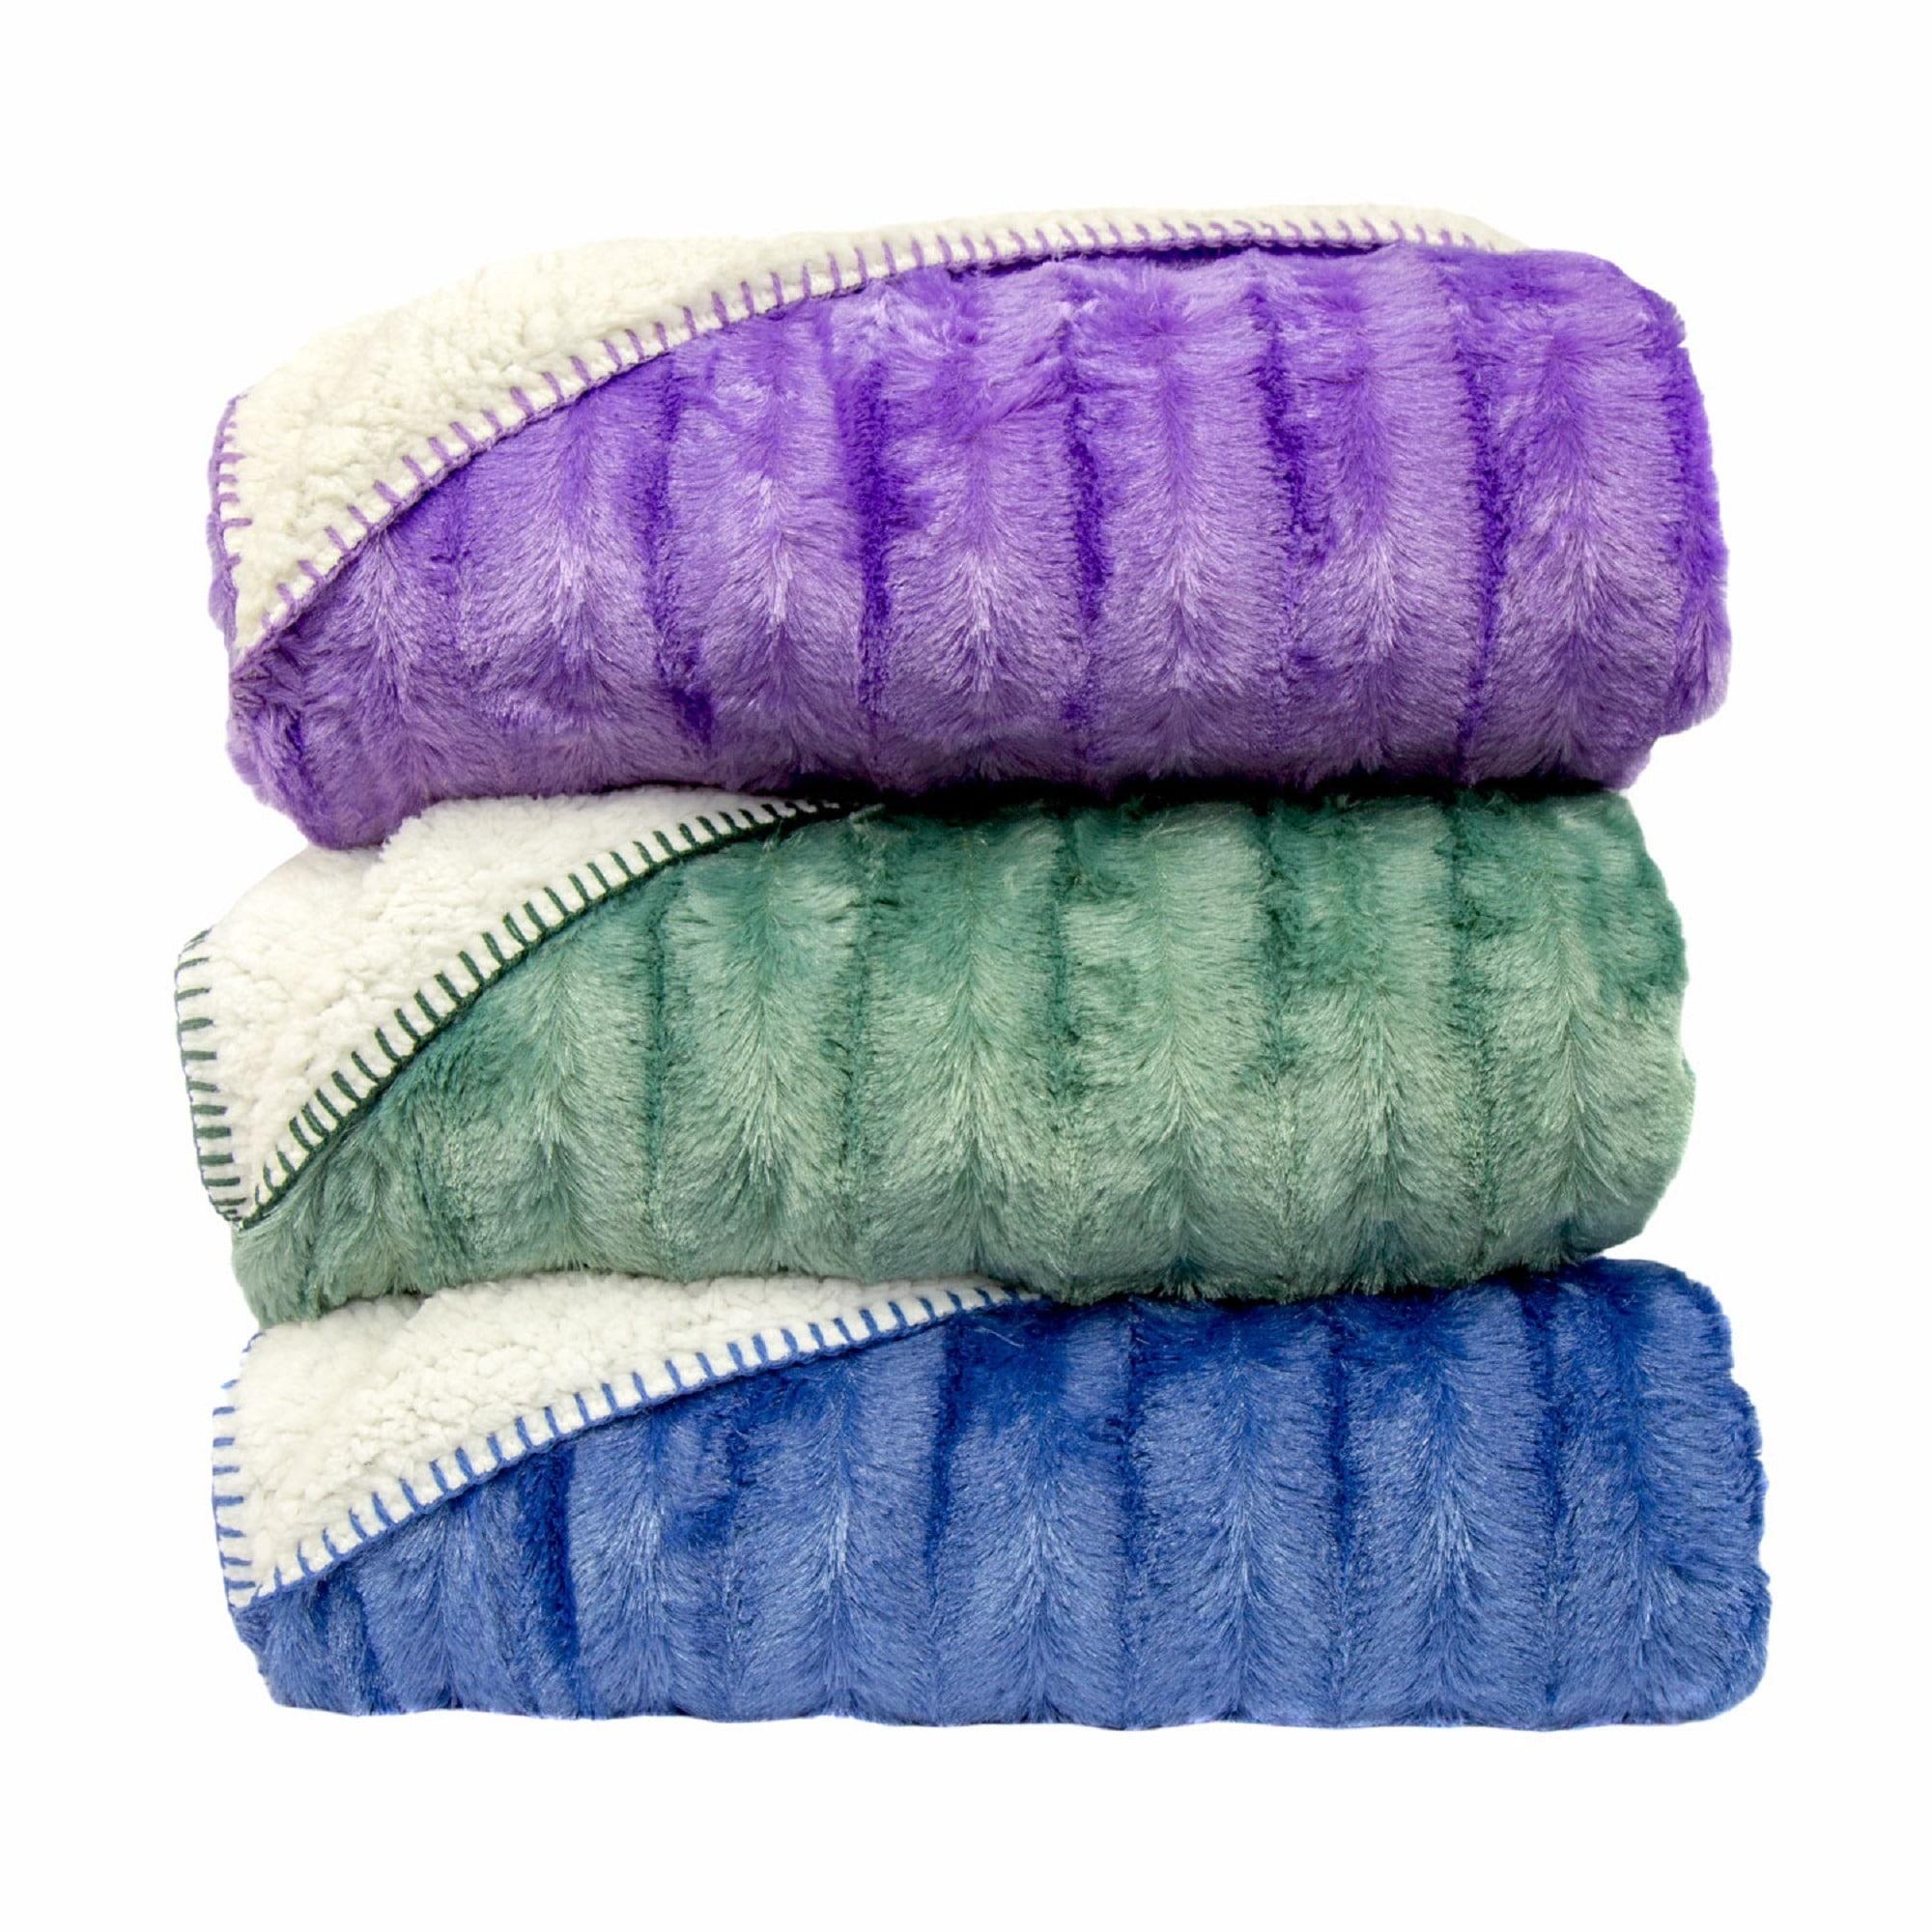 Oversized Super Soft Plush Fleece and Sherpa Throw Blanket